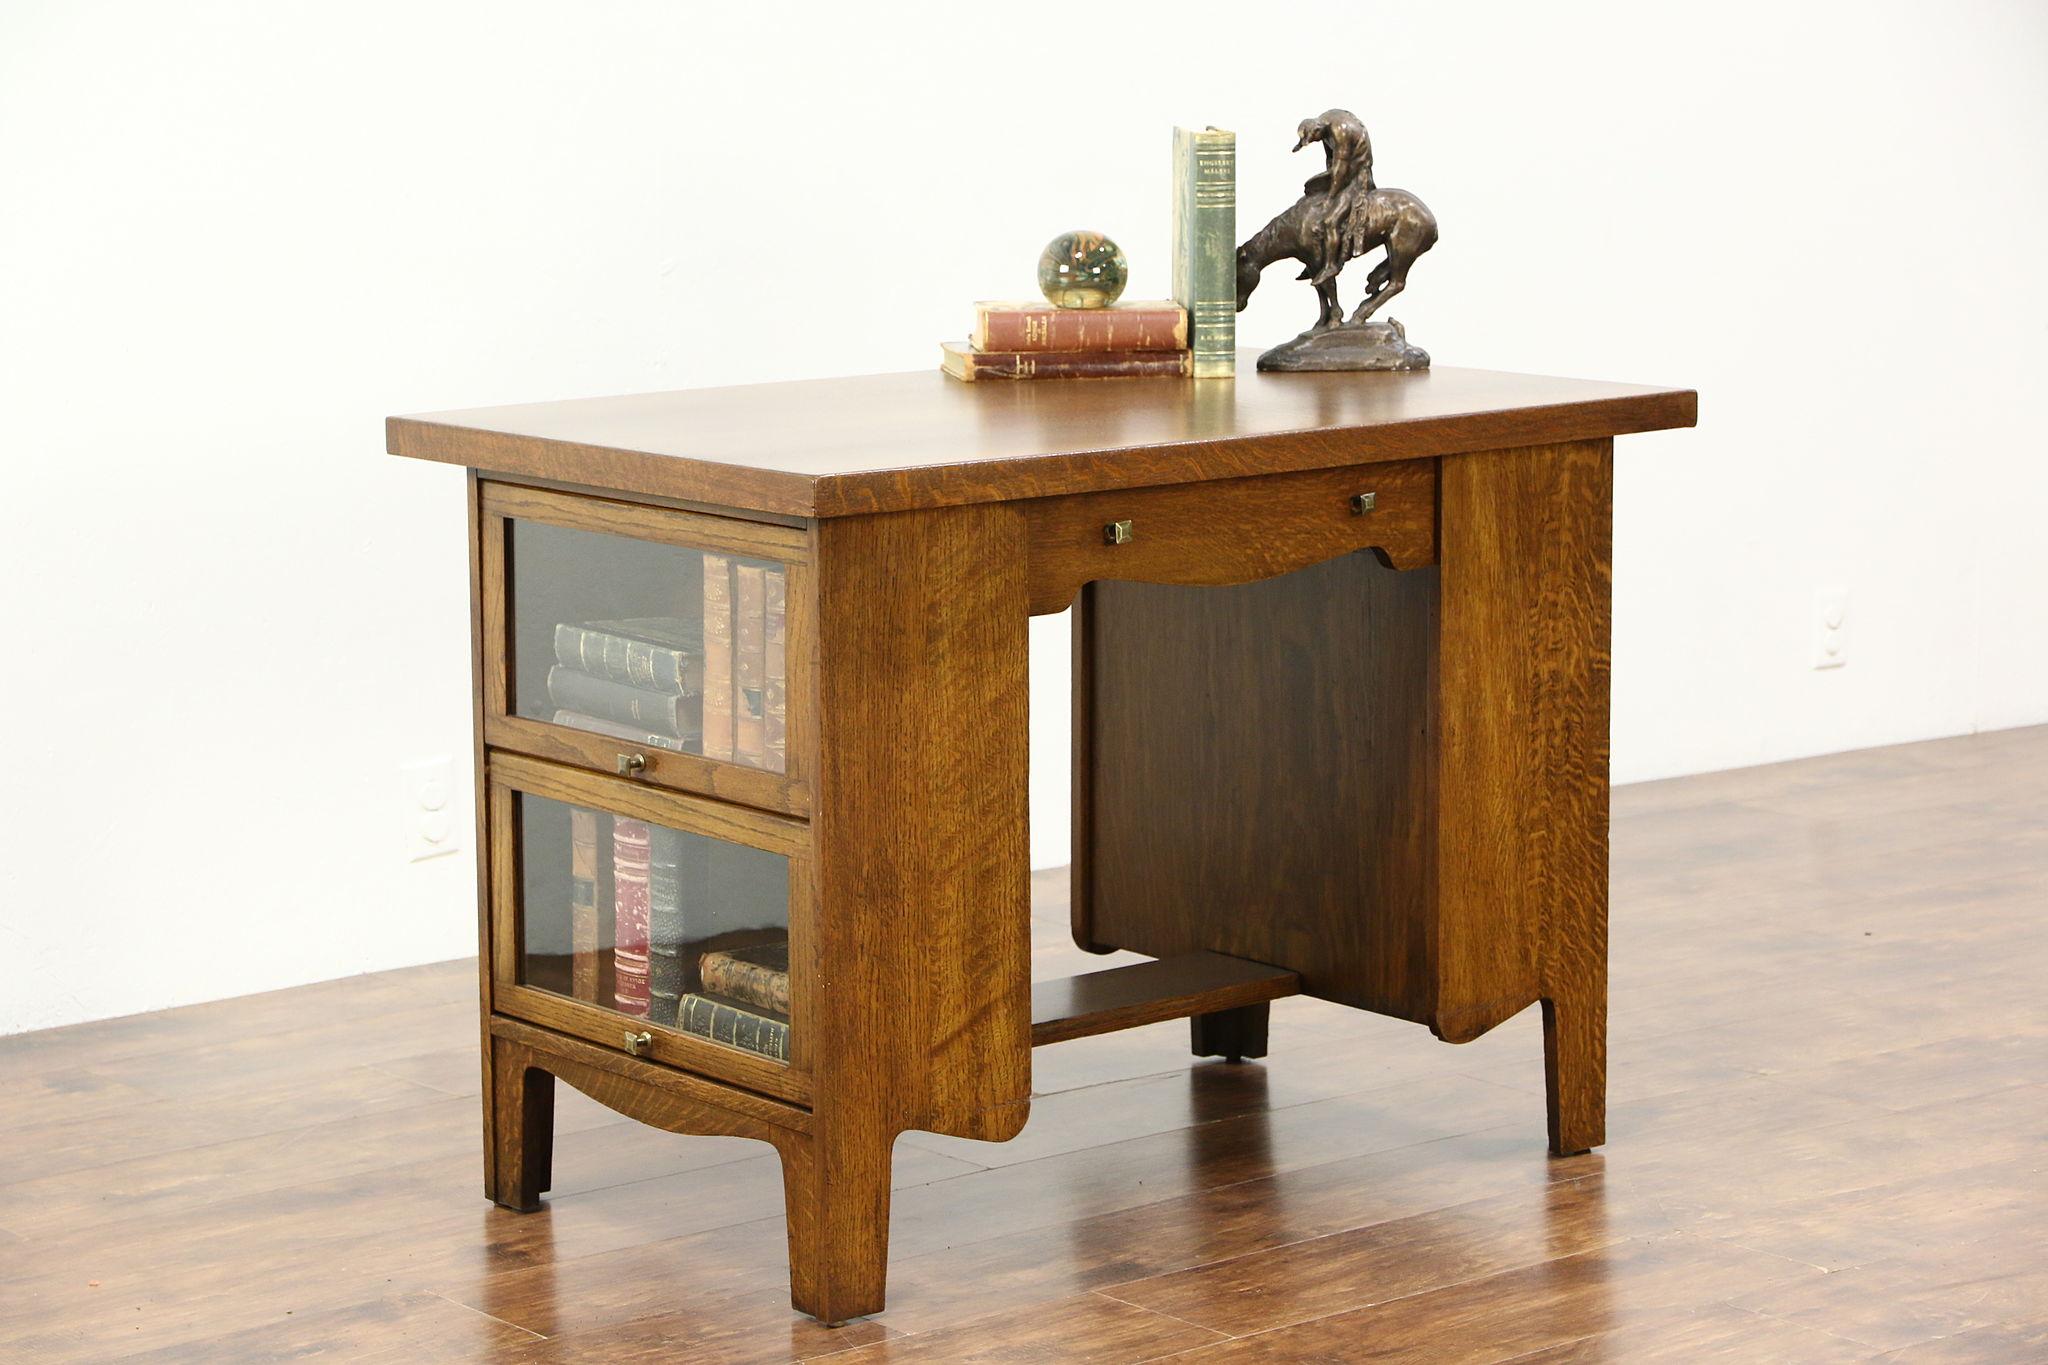 x table living end essentials coffee mocka room furniture bookshelf